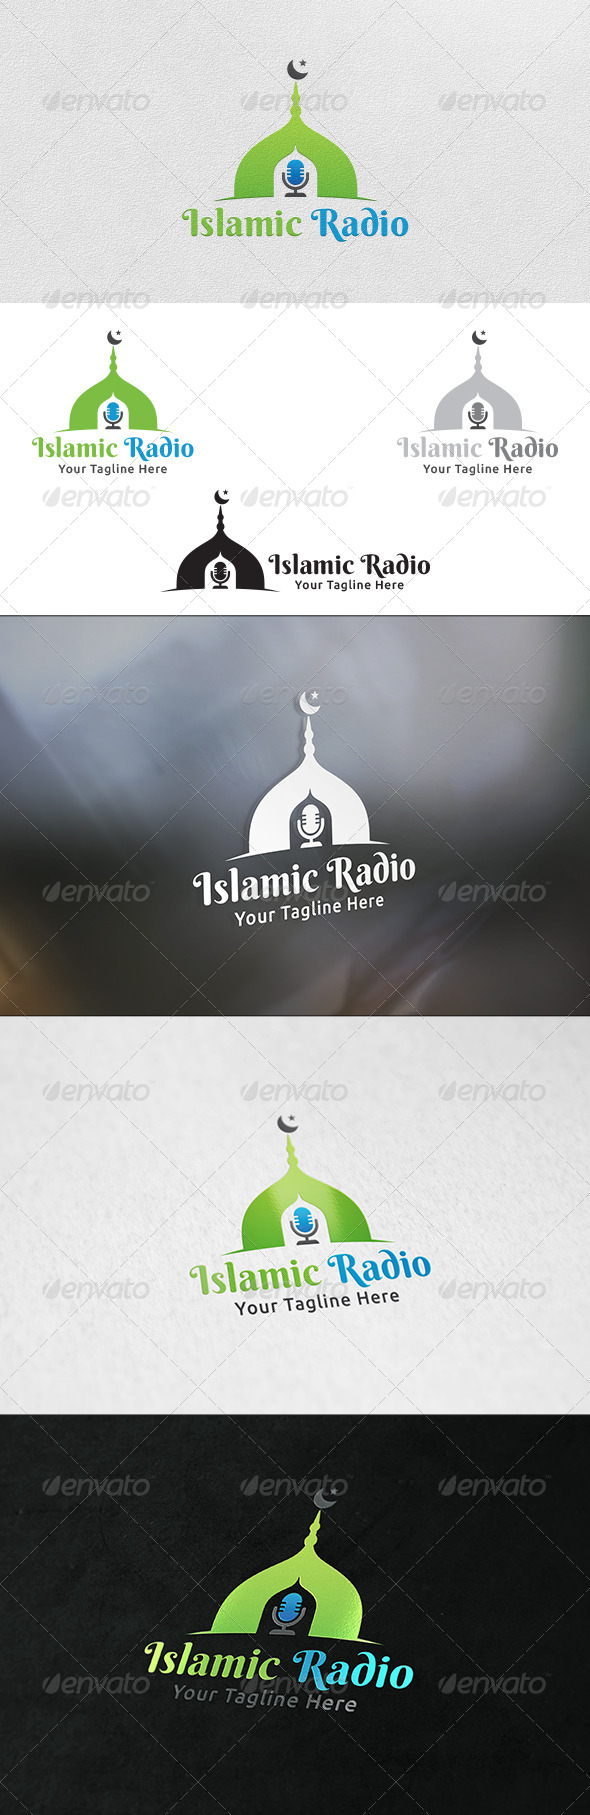 GraphicRiver Islamic Radio Logo Template 6131932